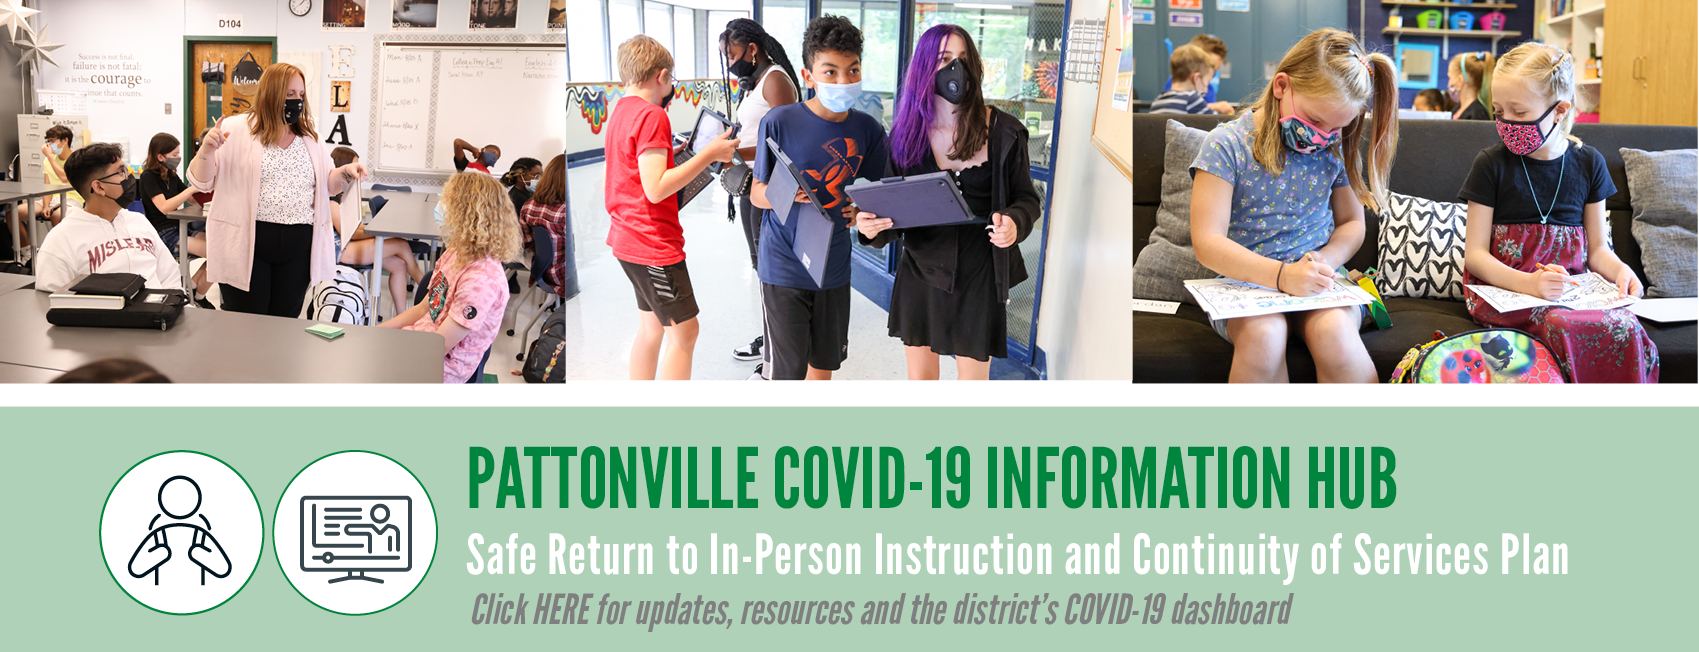 COVID-19 Info Hub